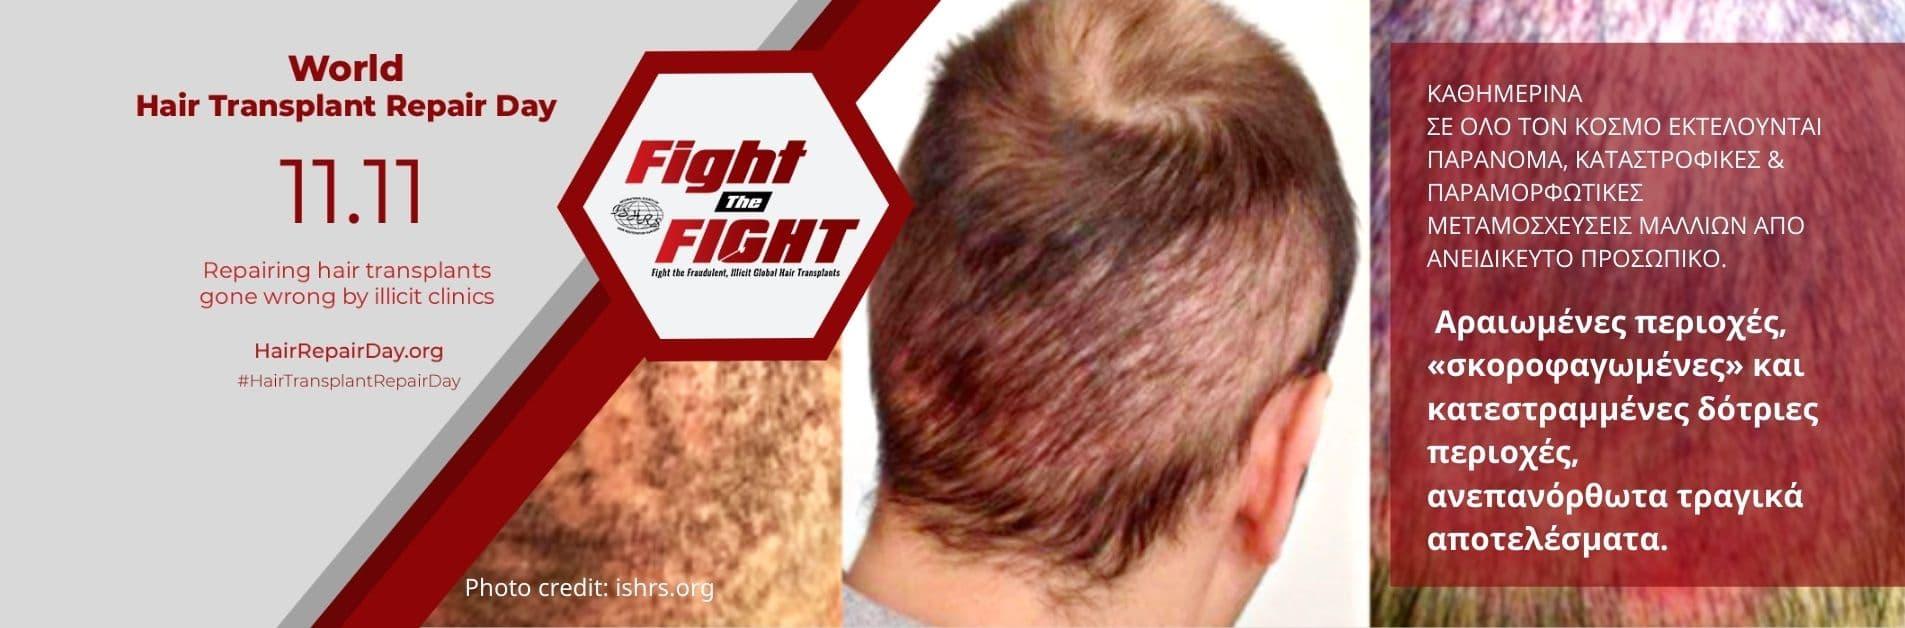 result of another bad hair transplantation